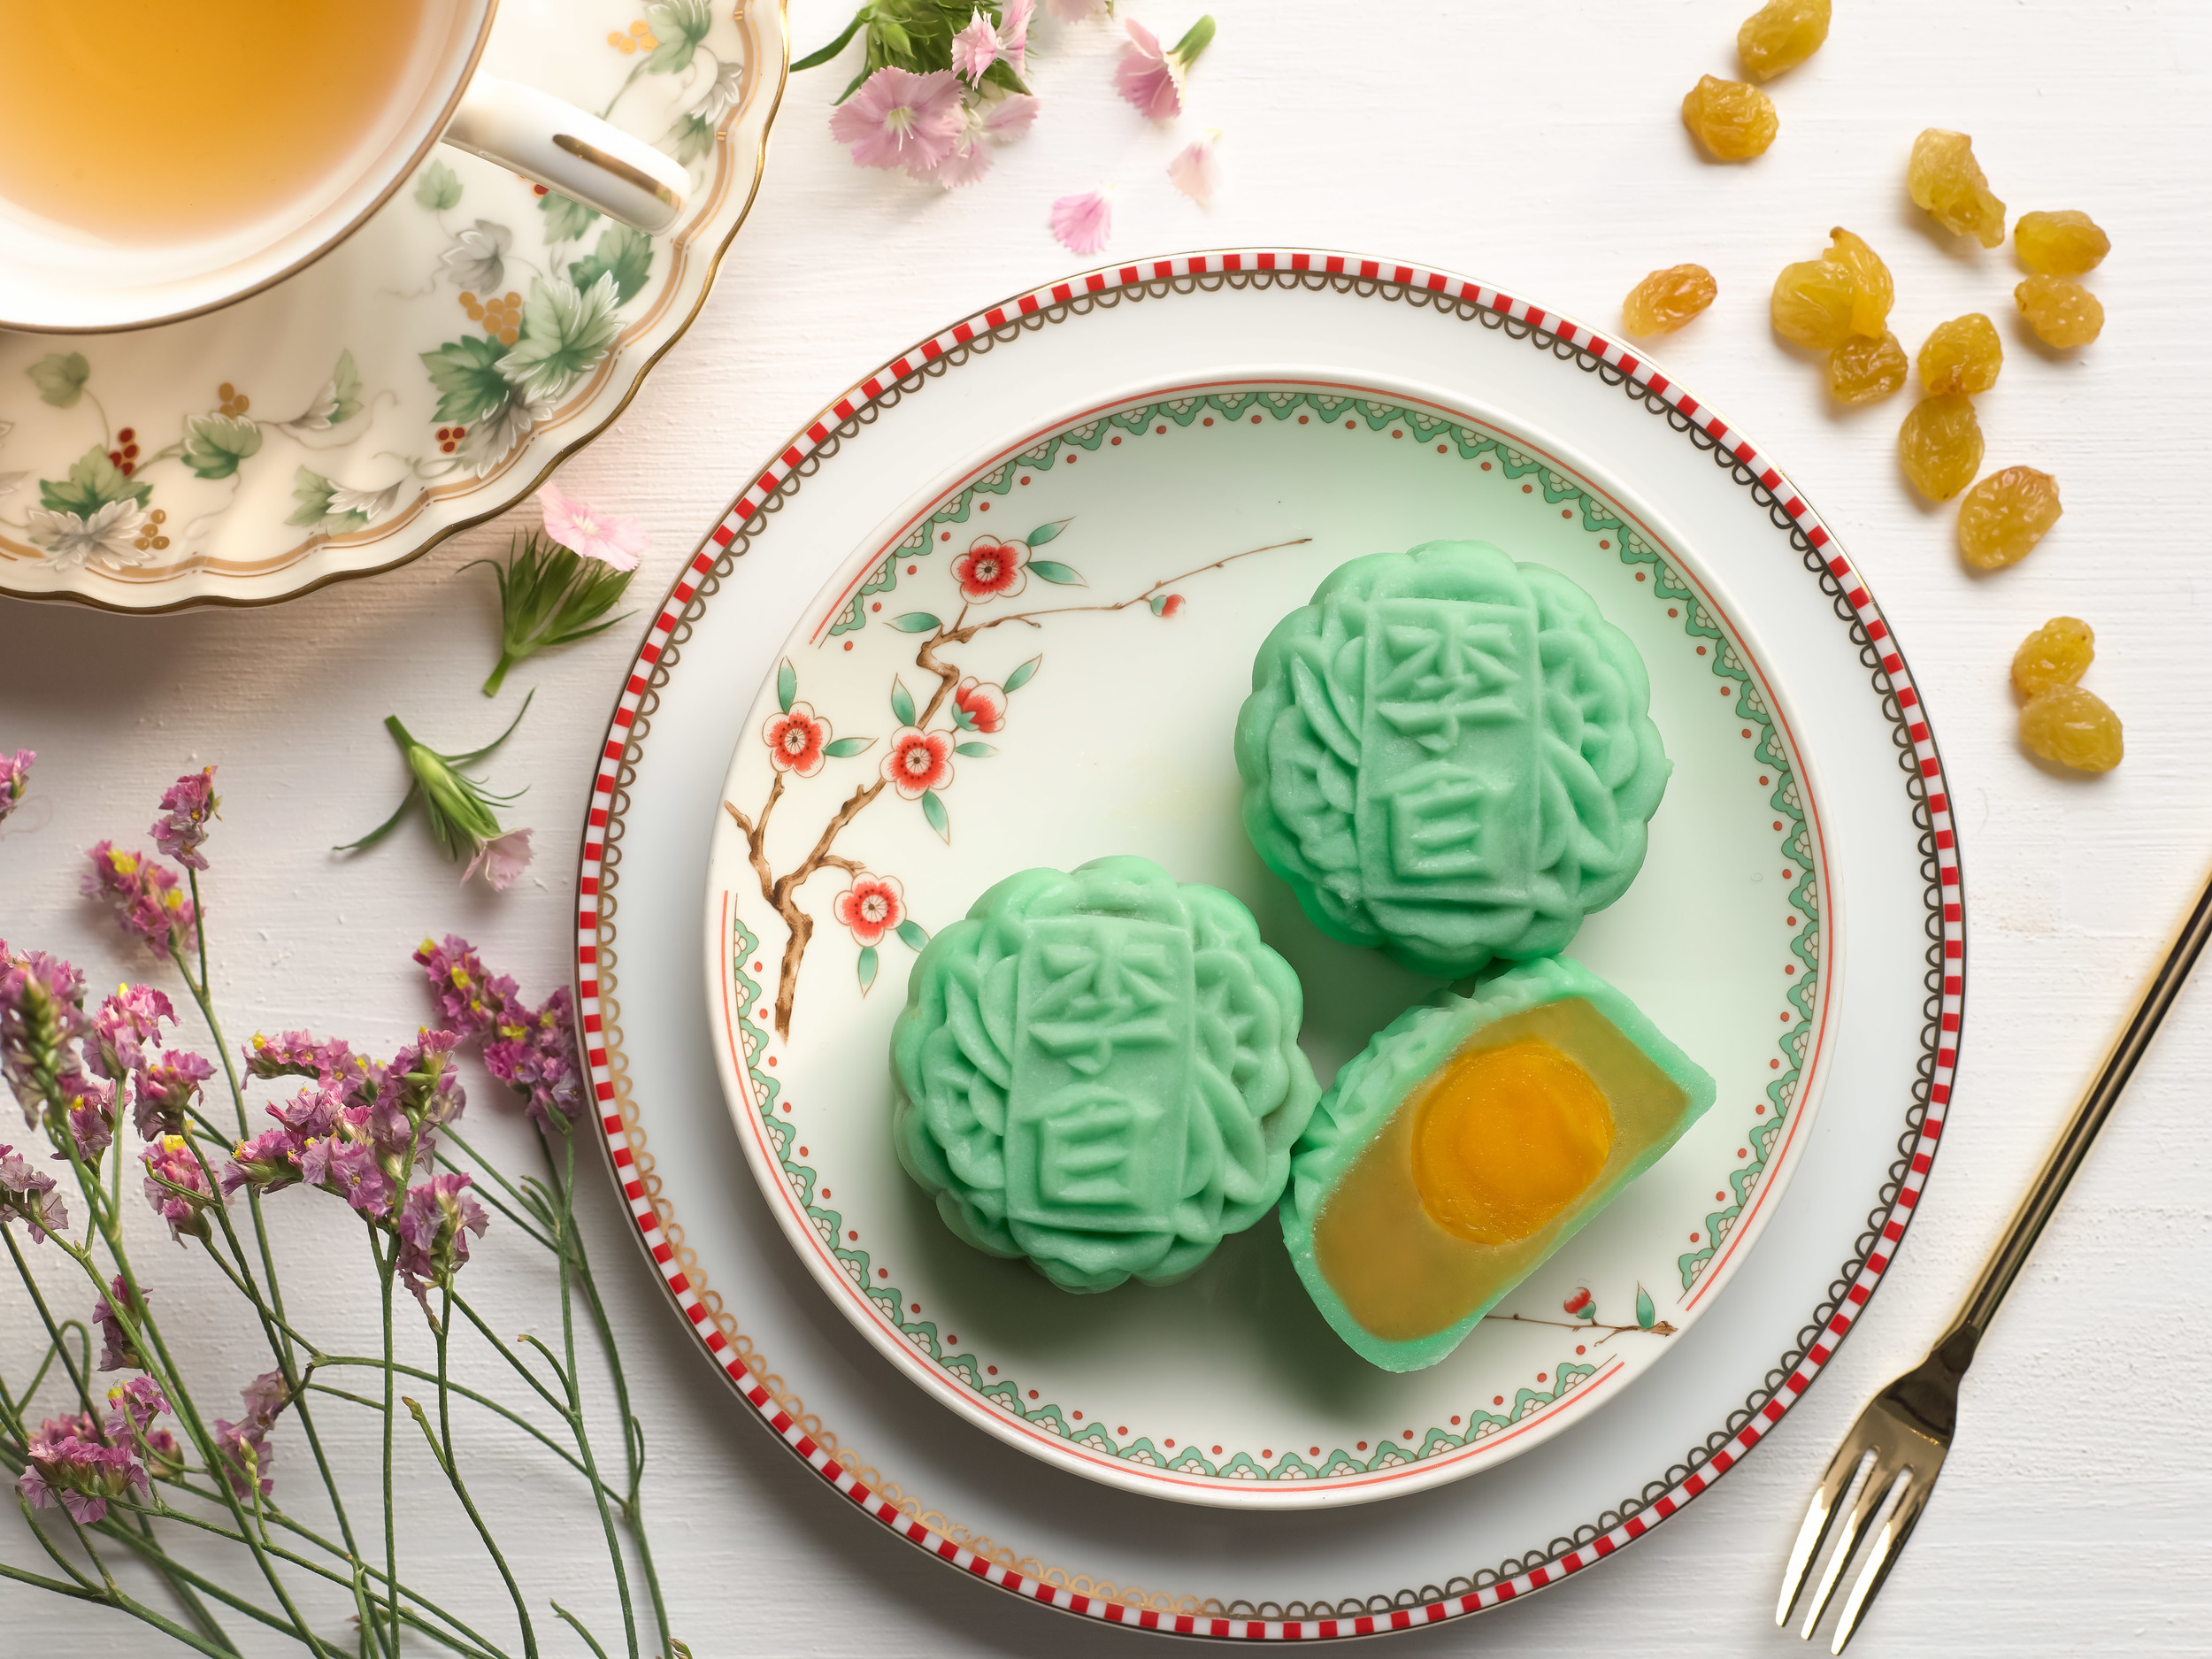 Mini Green Tea White Lotus Seed Paste with Yuzu Truffle (S$56 Nett for a Box of 8) | Photo Credit: Sheraton Towers Singapore